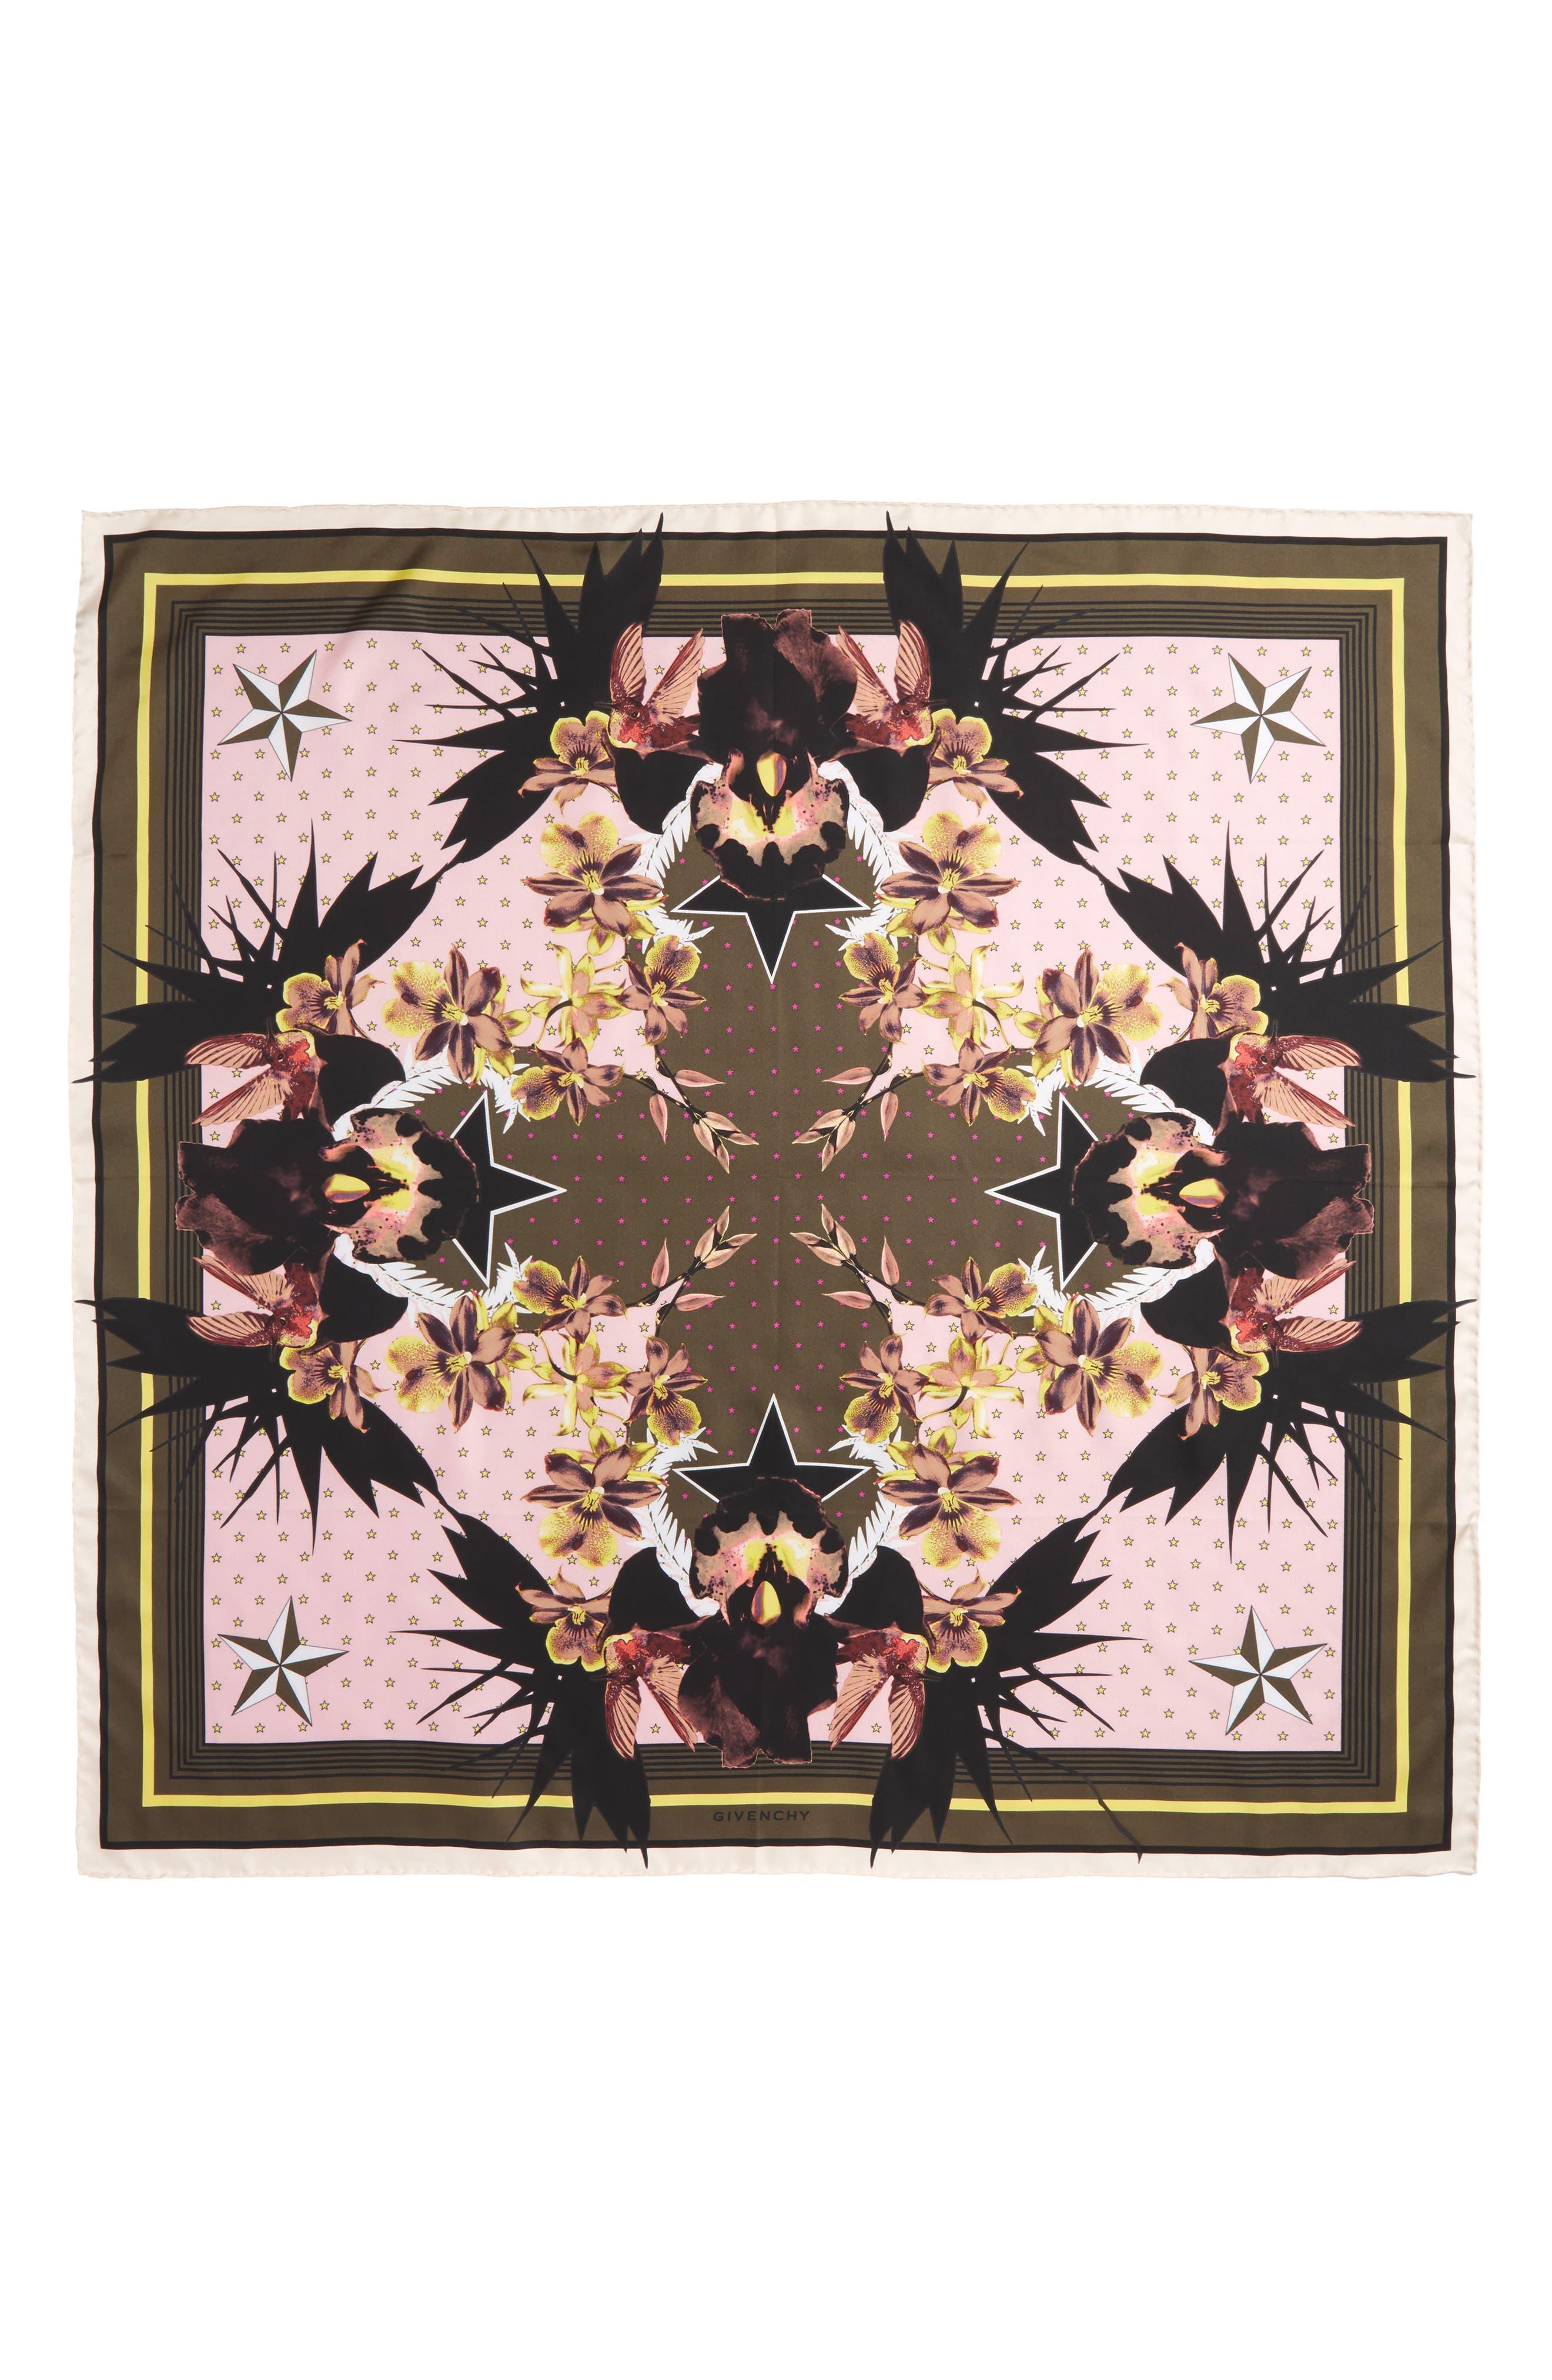 Givenchy Ultra Paradise Silk Scarf